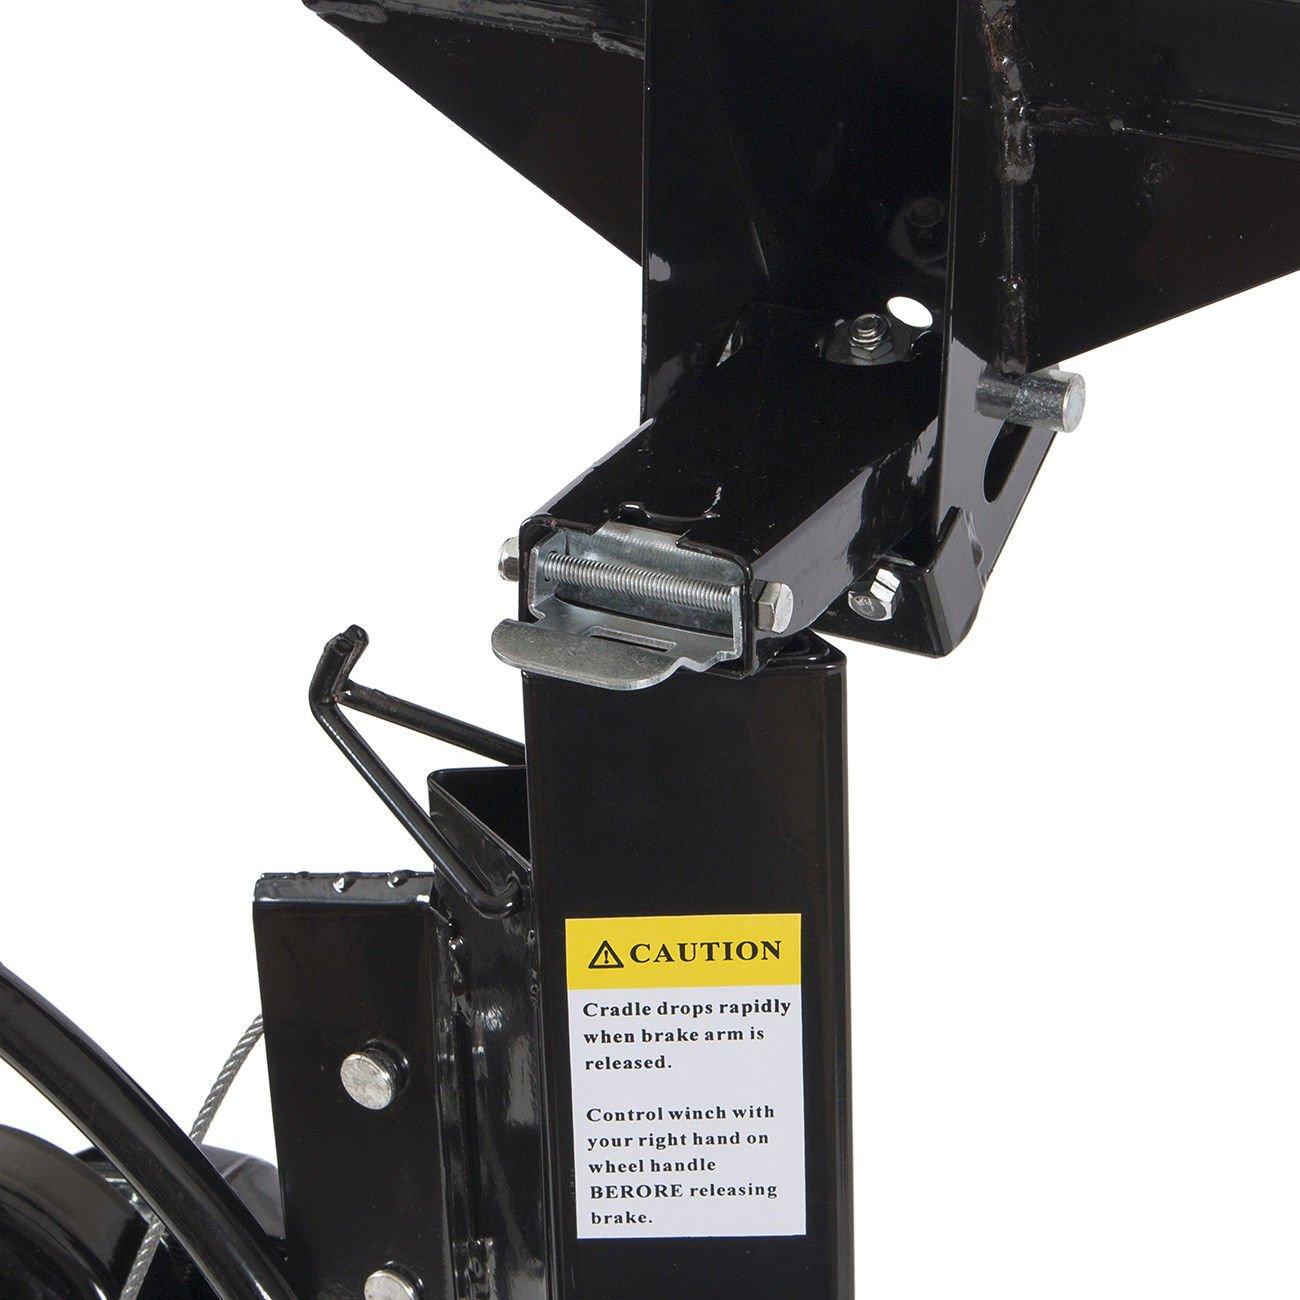 Drywall Lift 11' 15' Lift Panel Hoist Dry Wall Jack Lifter Construction -Black by Happybeamy (Image #3)